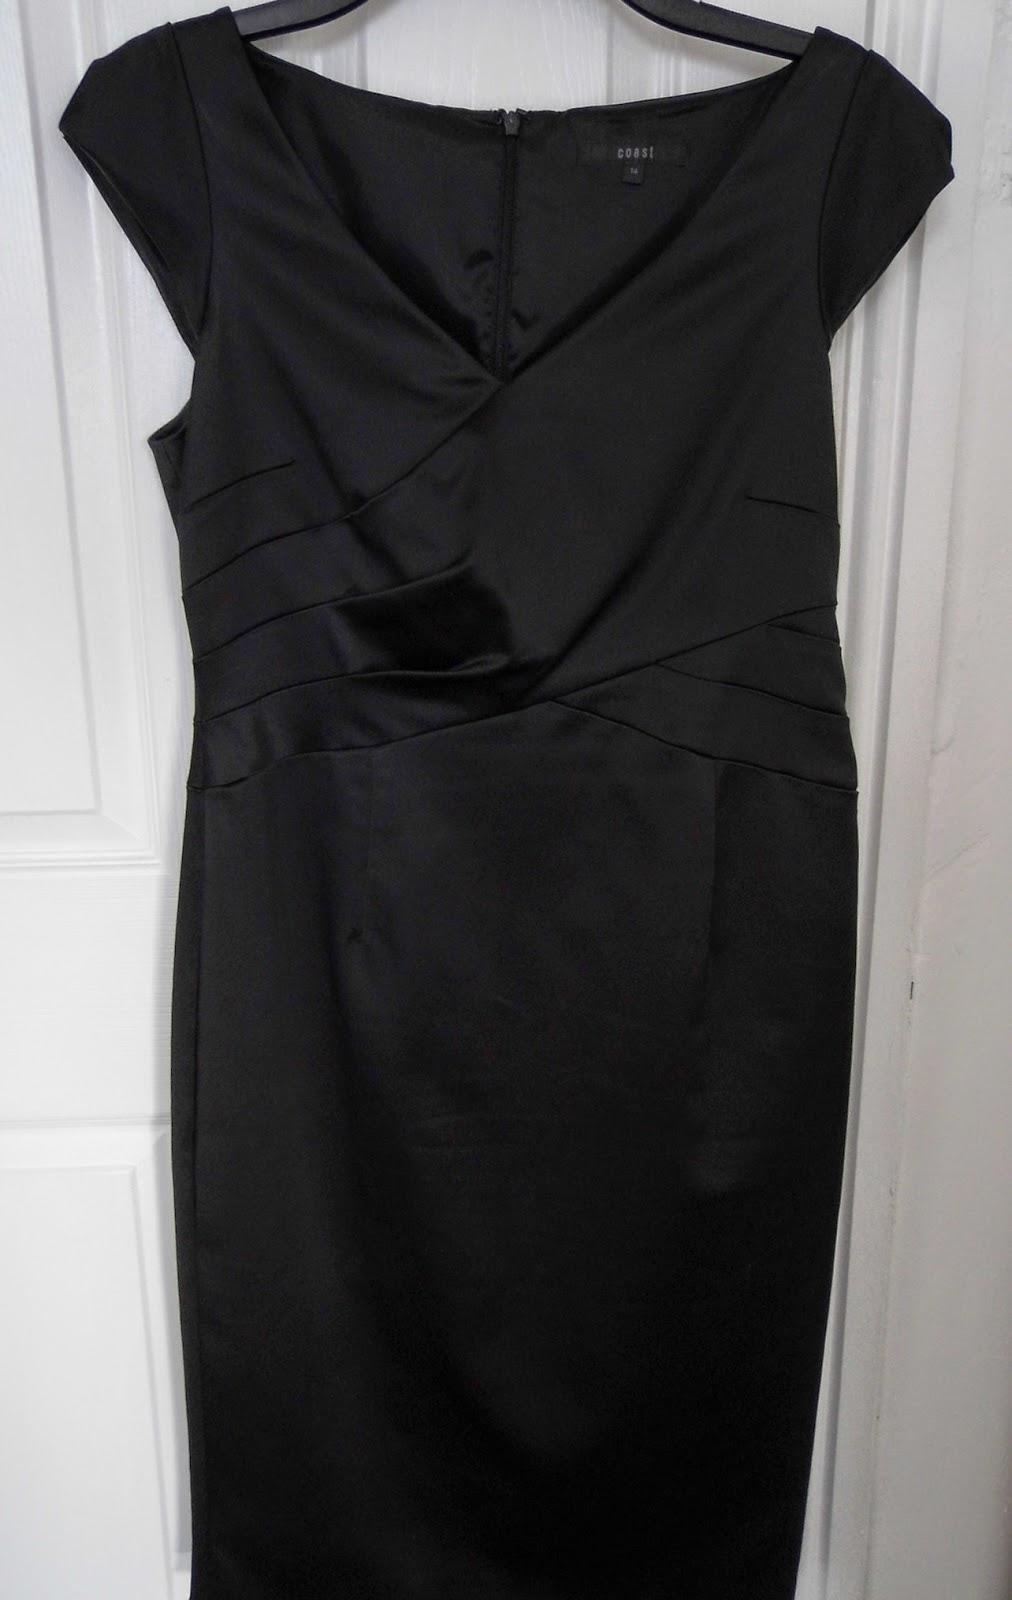 Black dress coast - Satin Black Dress By Coast